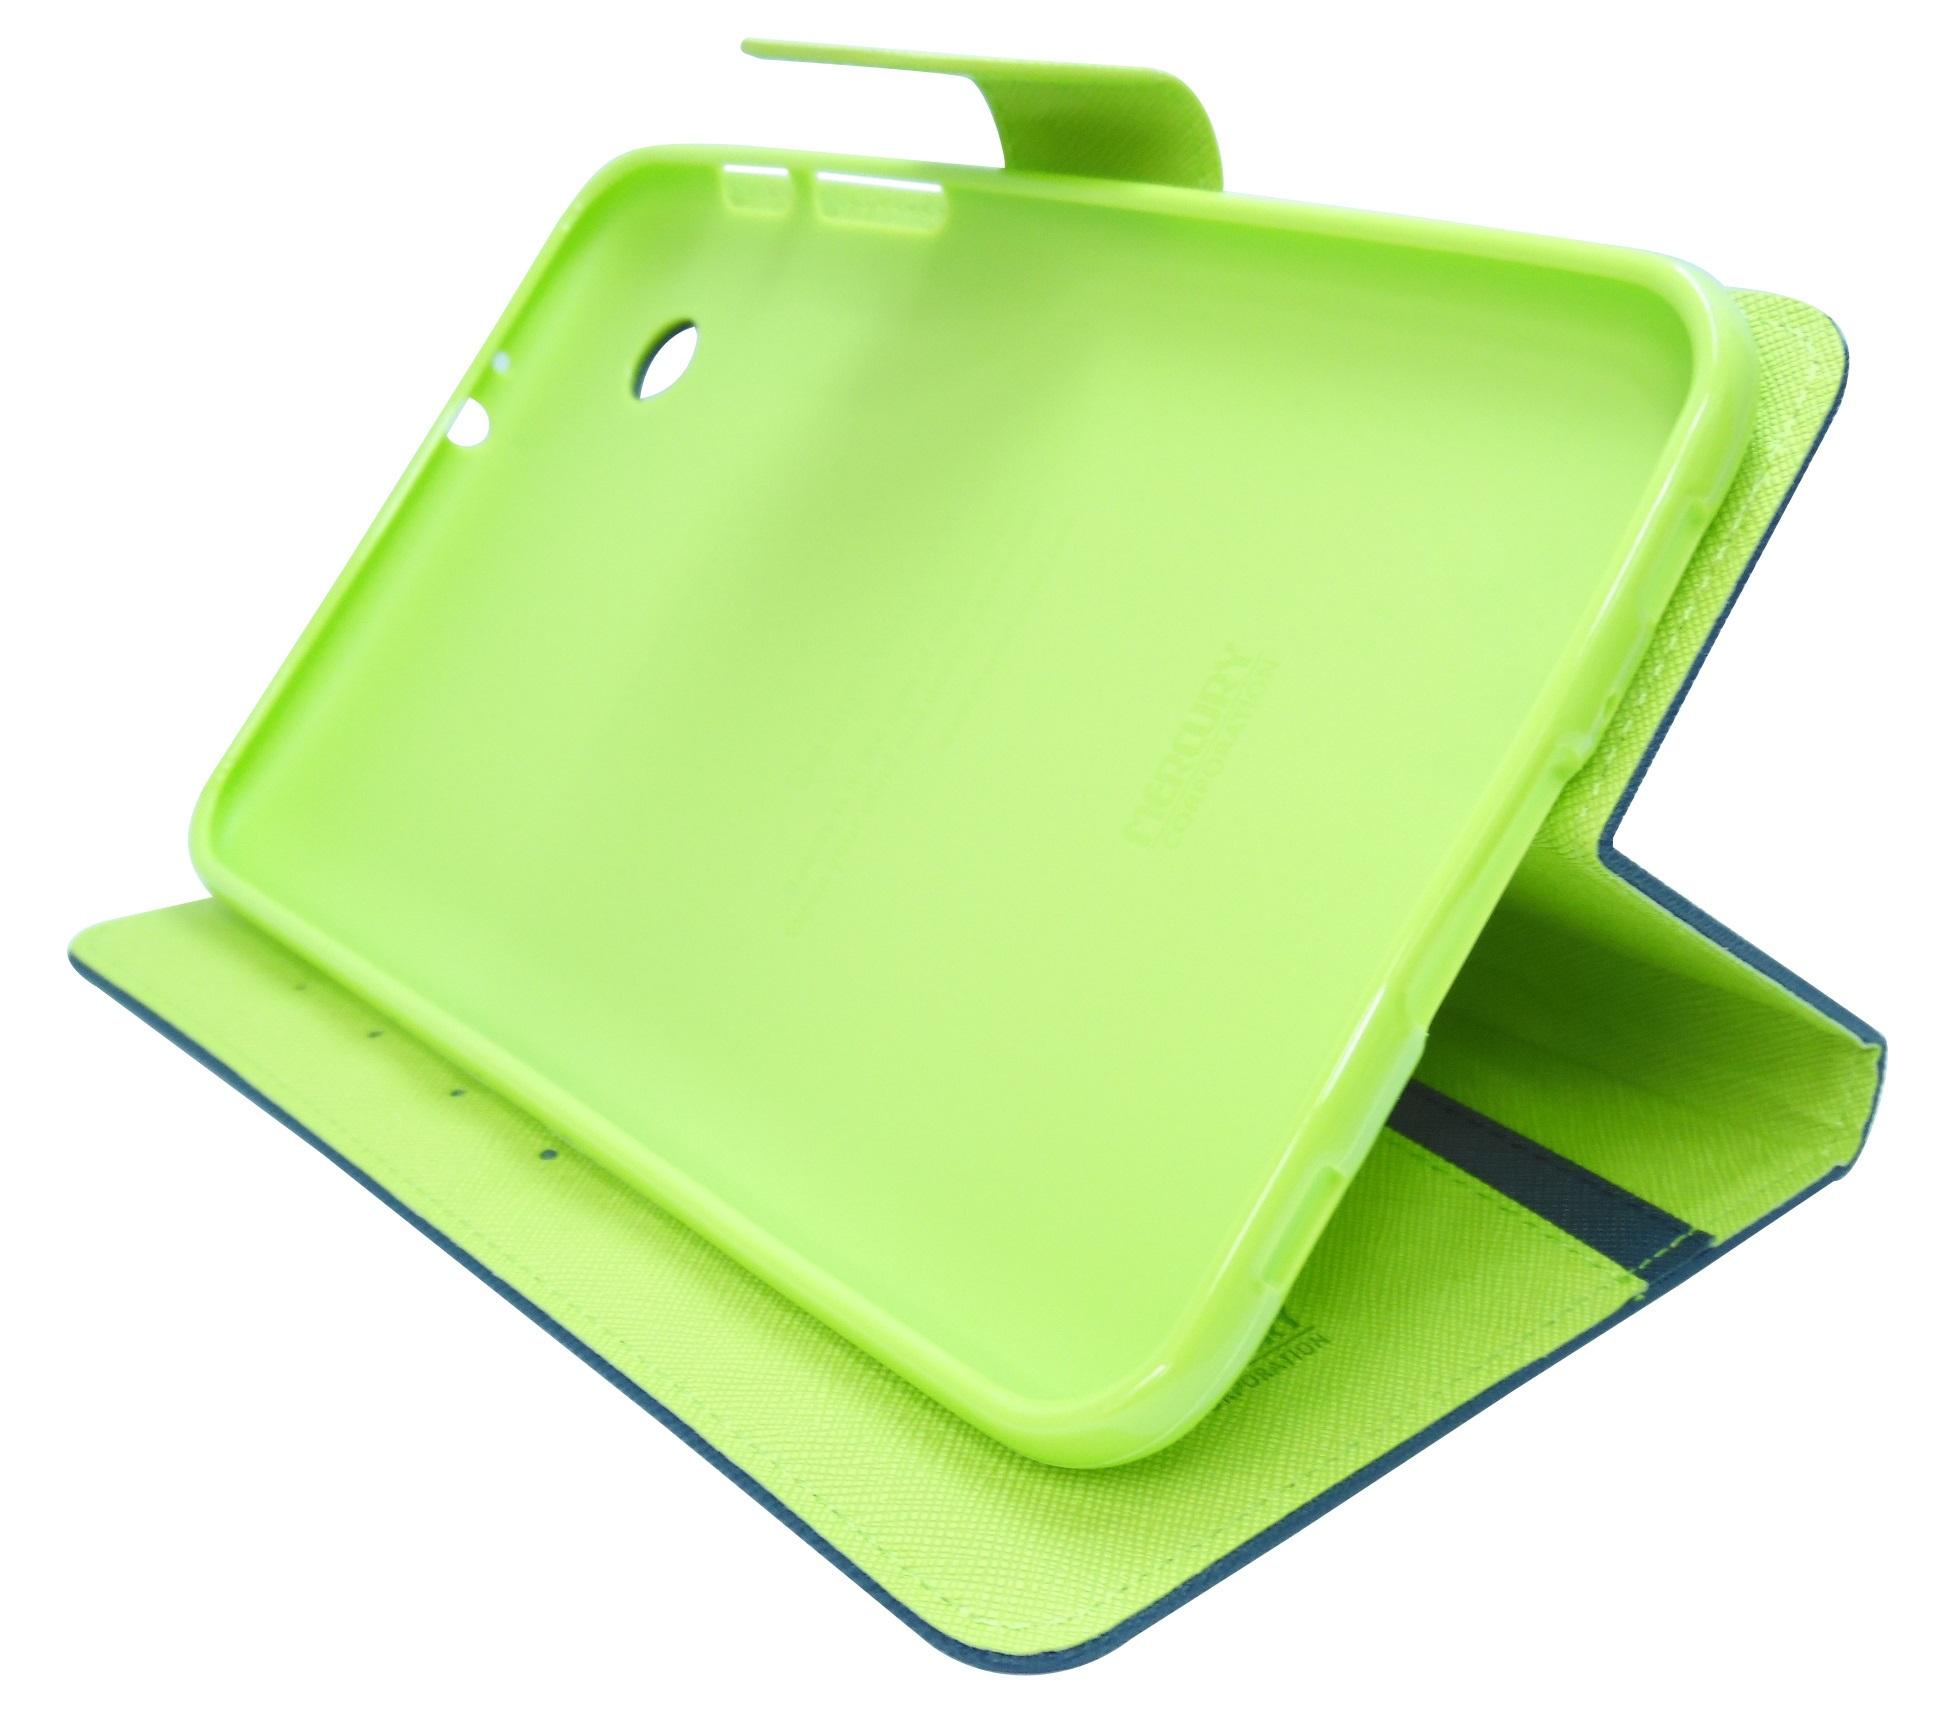 Husa tip carte Mercury Goospery Fancy Diary bleumarin + verde deschis pentru Samsung Galaxy Tab 2 P3100 / P3110